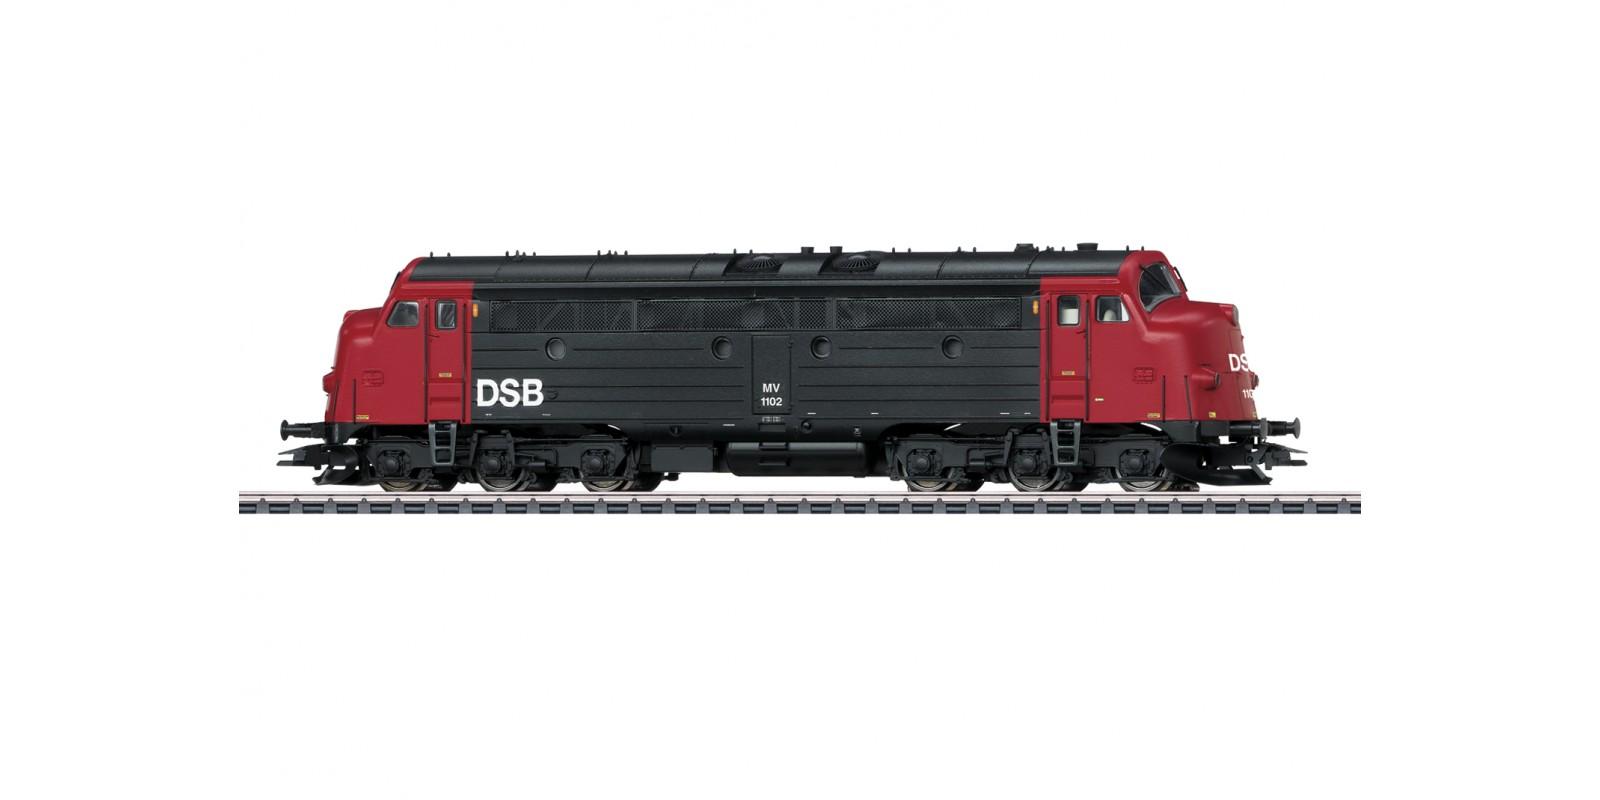 39685 Class MV Diesel Locomotive